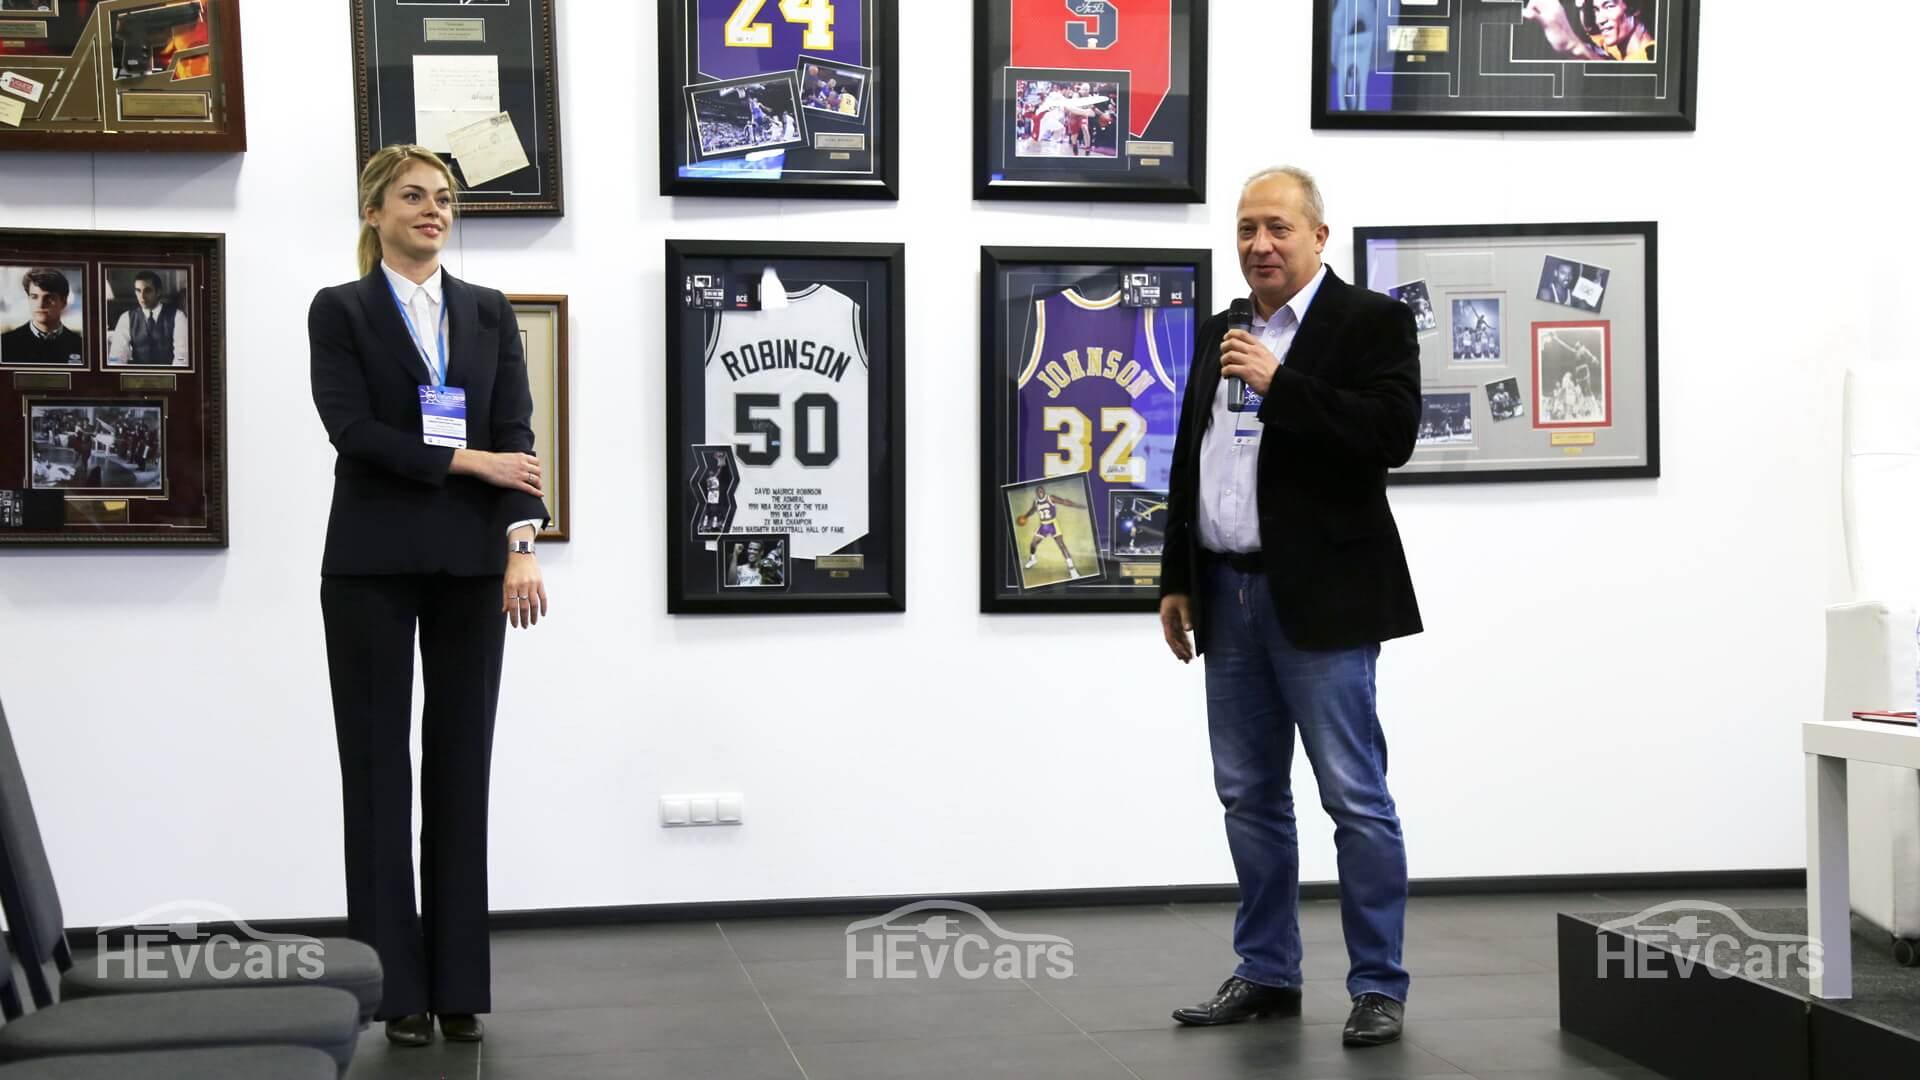 Марина Кытина и Cергей Крот